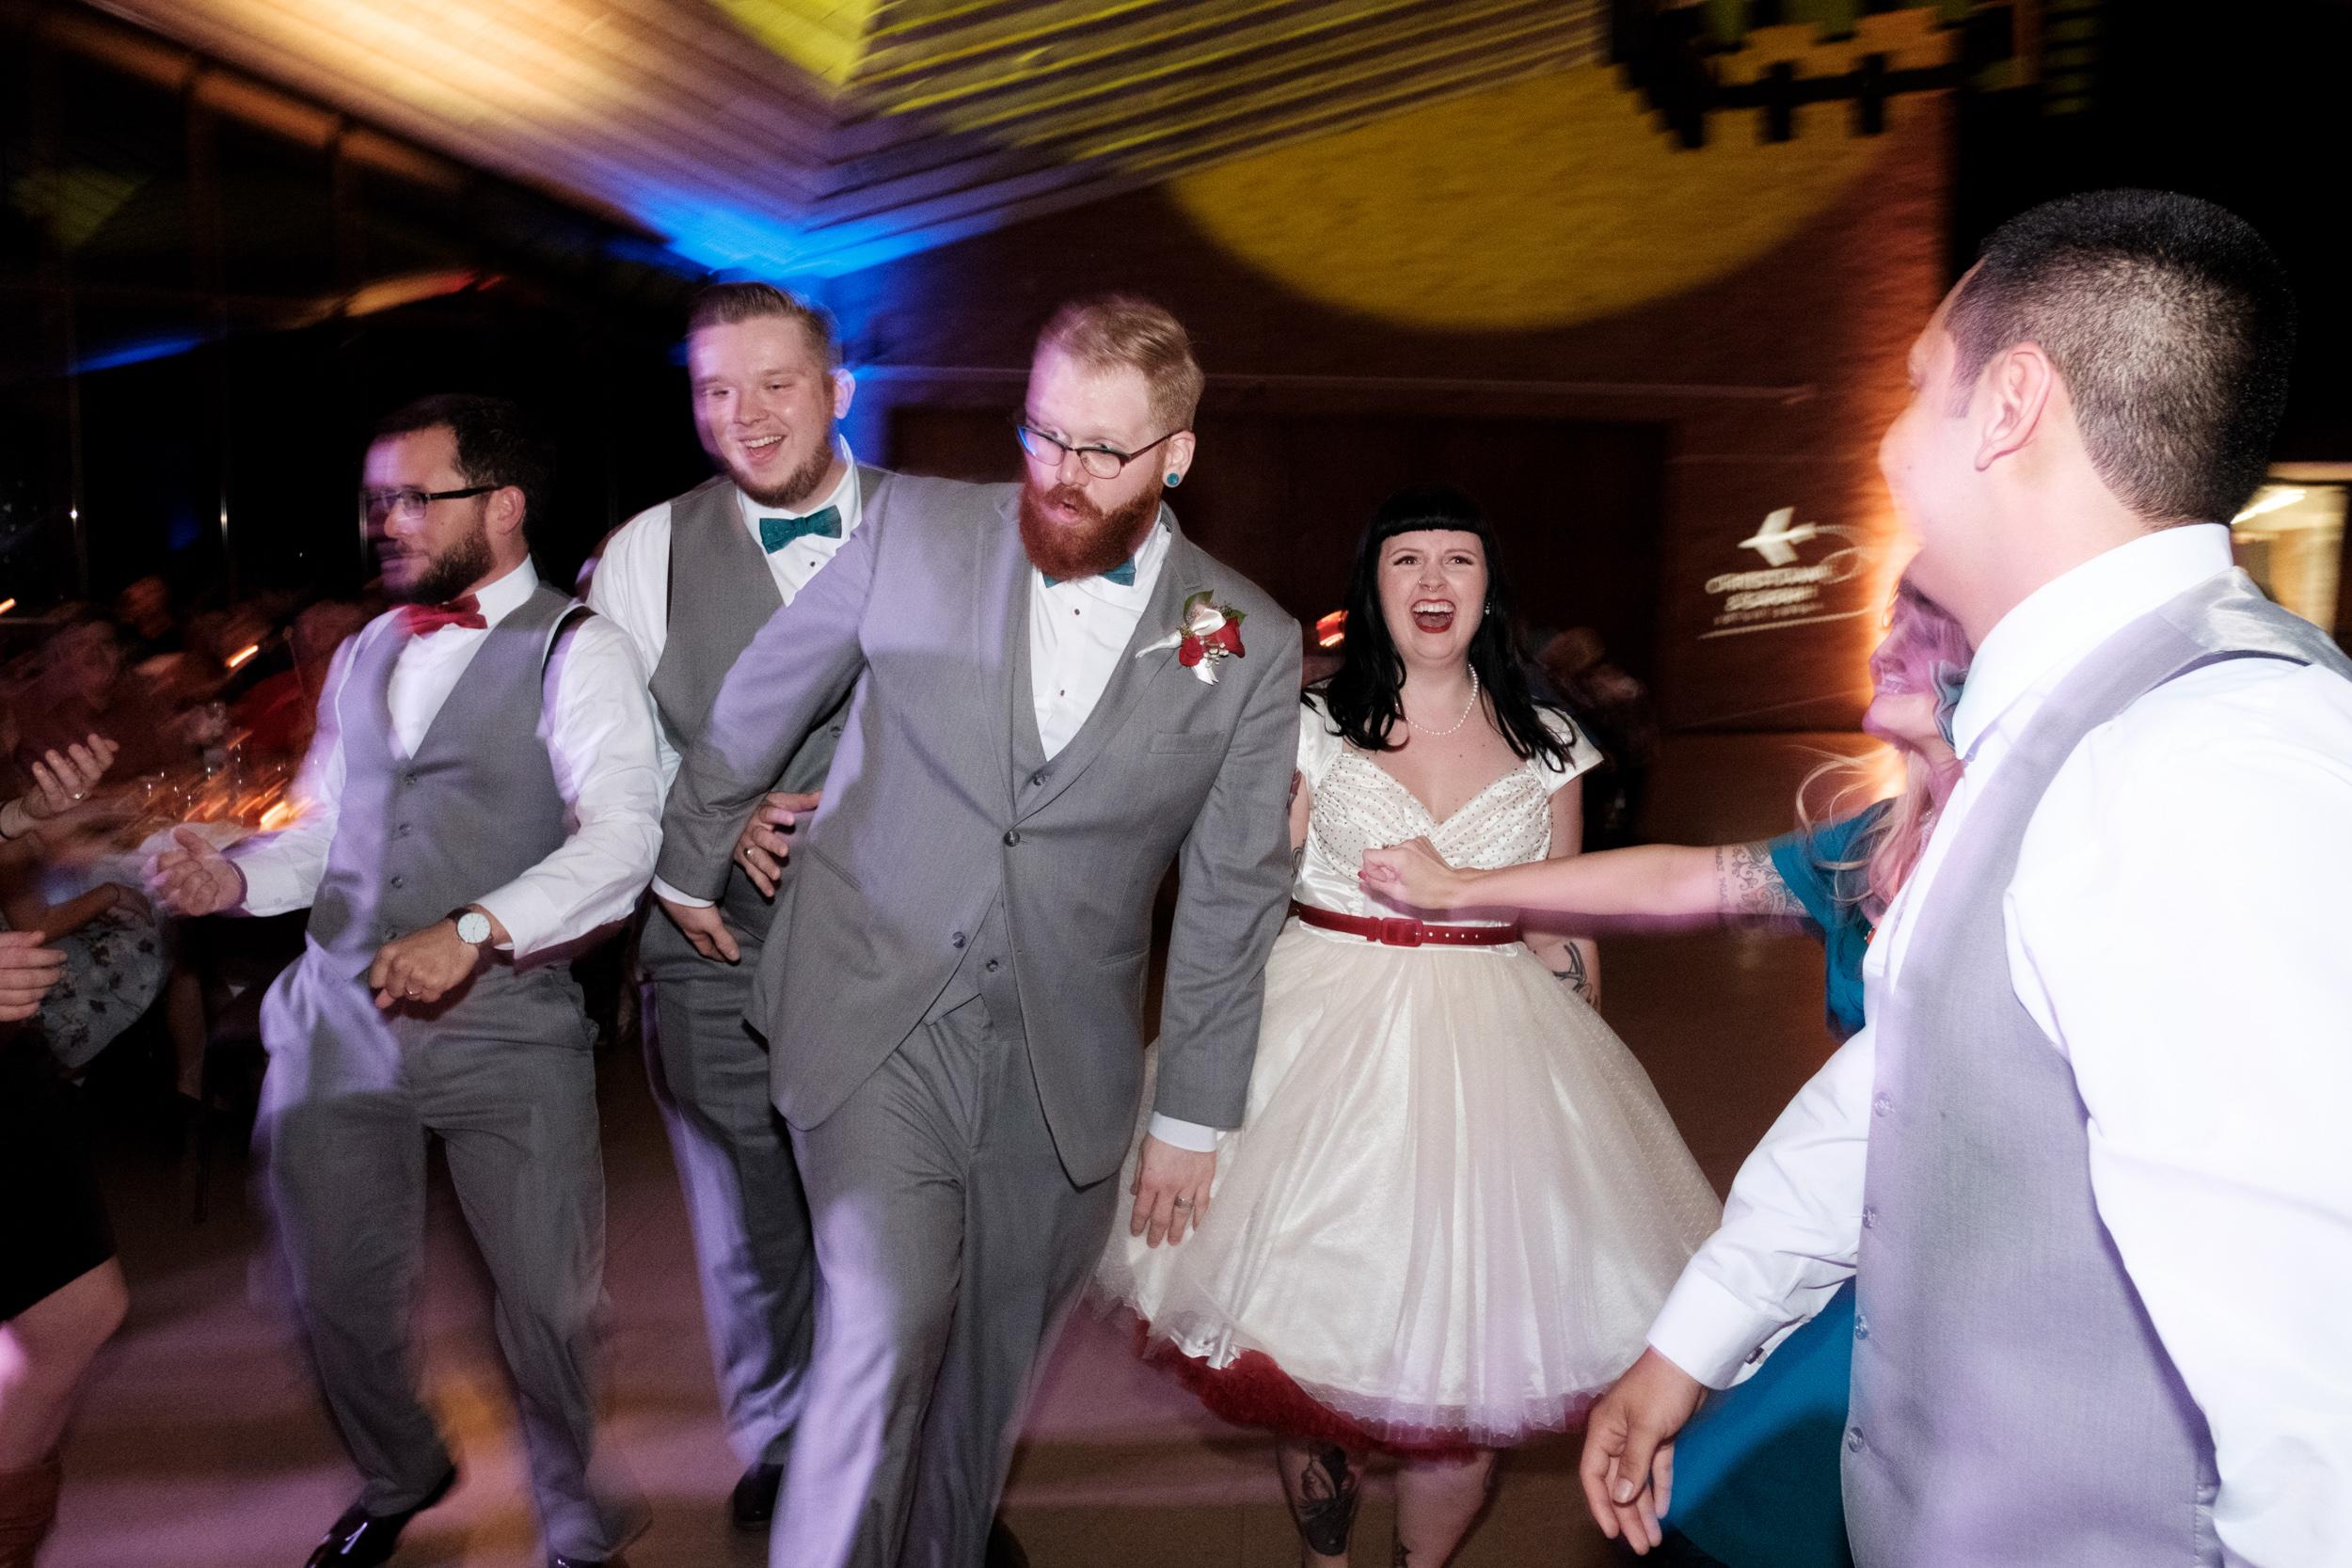 Christian & Sarah wedding photography by Brian milo-258.jpg